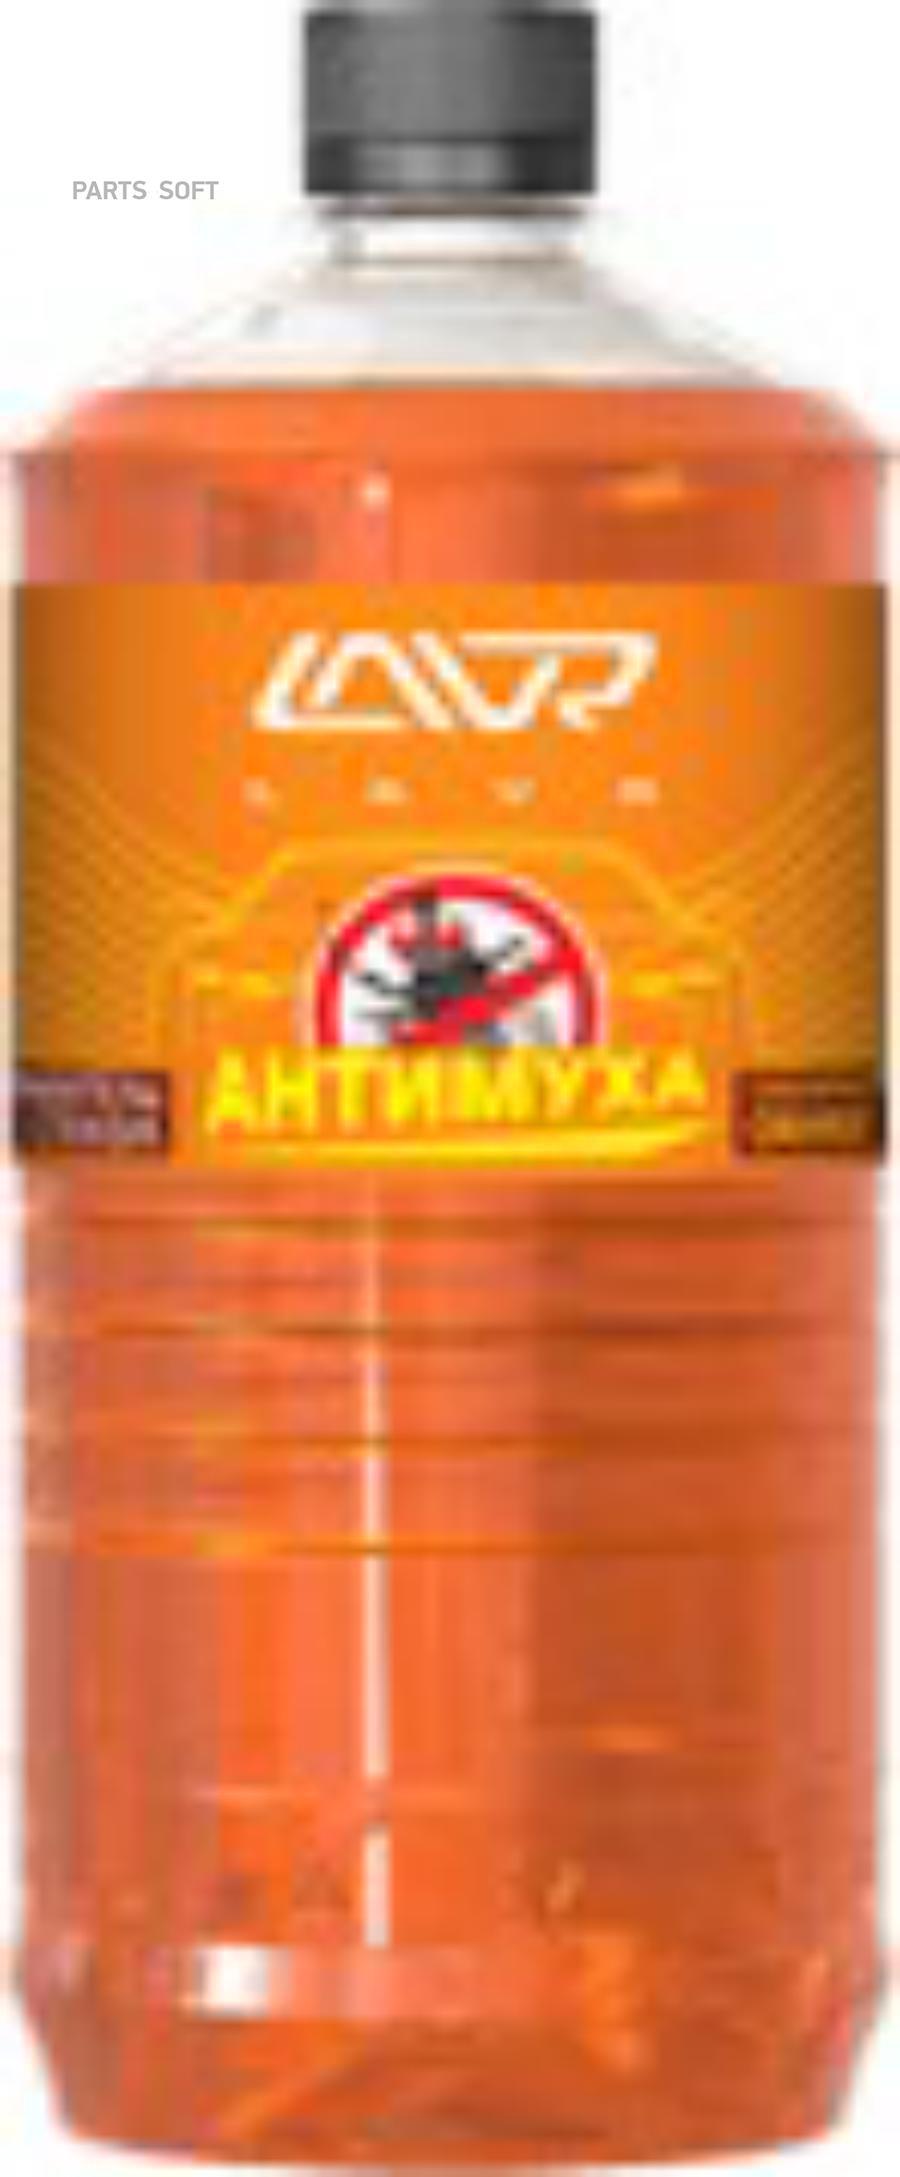 Омыватель стекол Orange Анти Муха концентрат LAVR Glass Washer Concentrate Anti Fly 1000мл